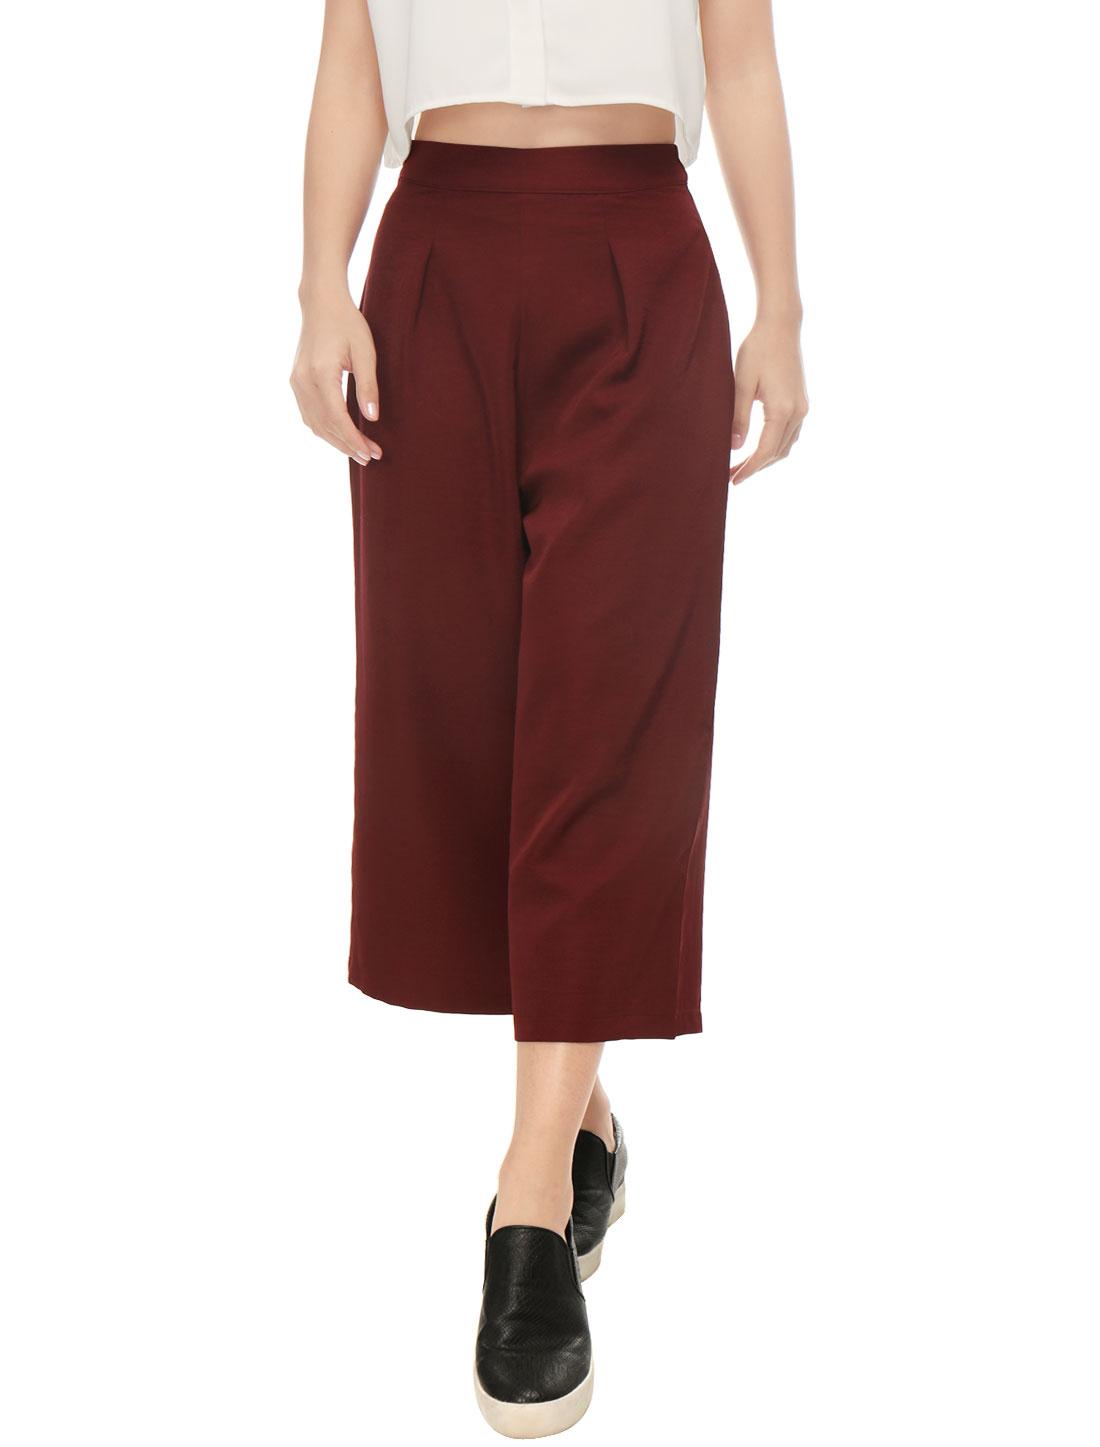 Allegra K Women Concealed Zipper Side Loose Capris Culottes Red XS